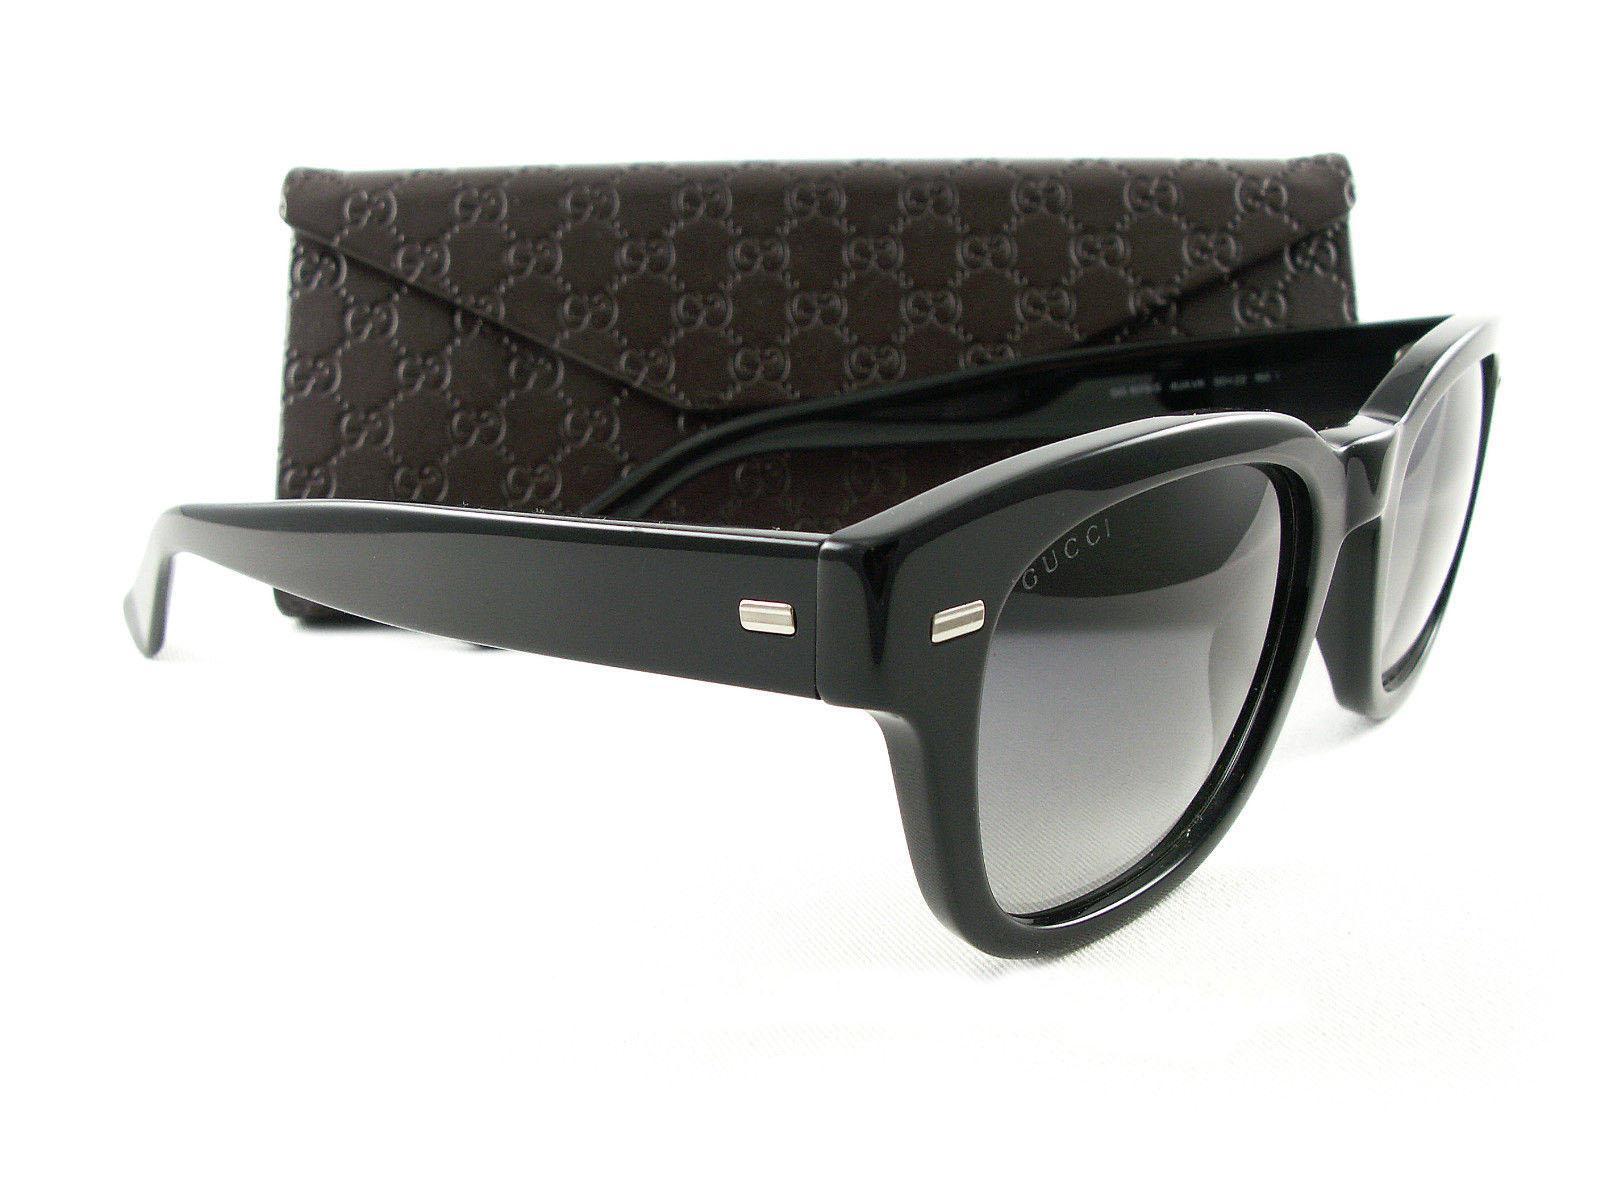 eefdc56f6a1 New Gucci Sunglasses GG 1078 s Black 4UAVK Authentic – AAM